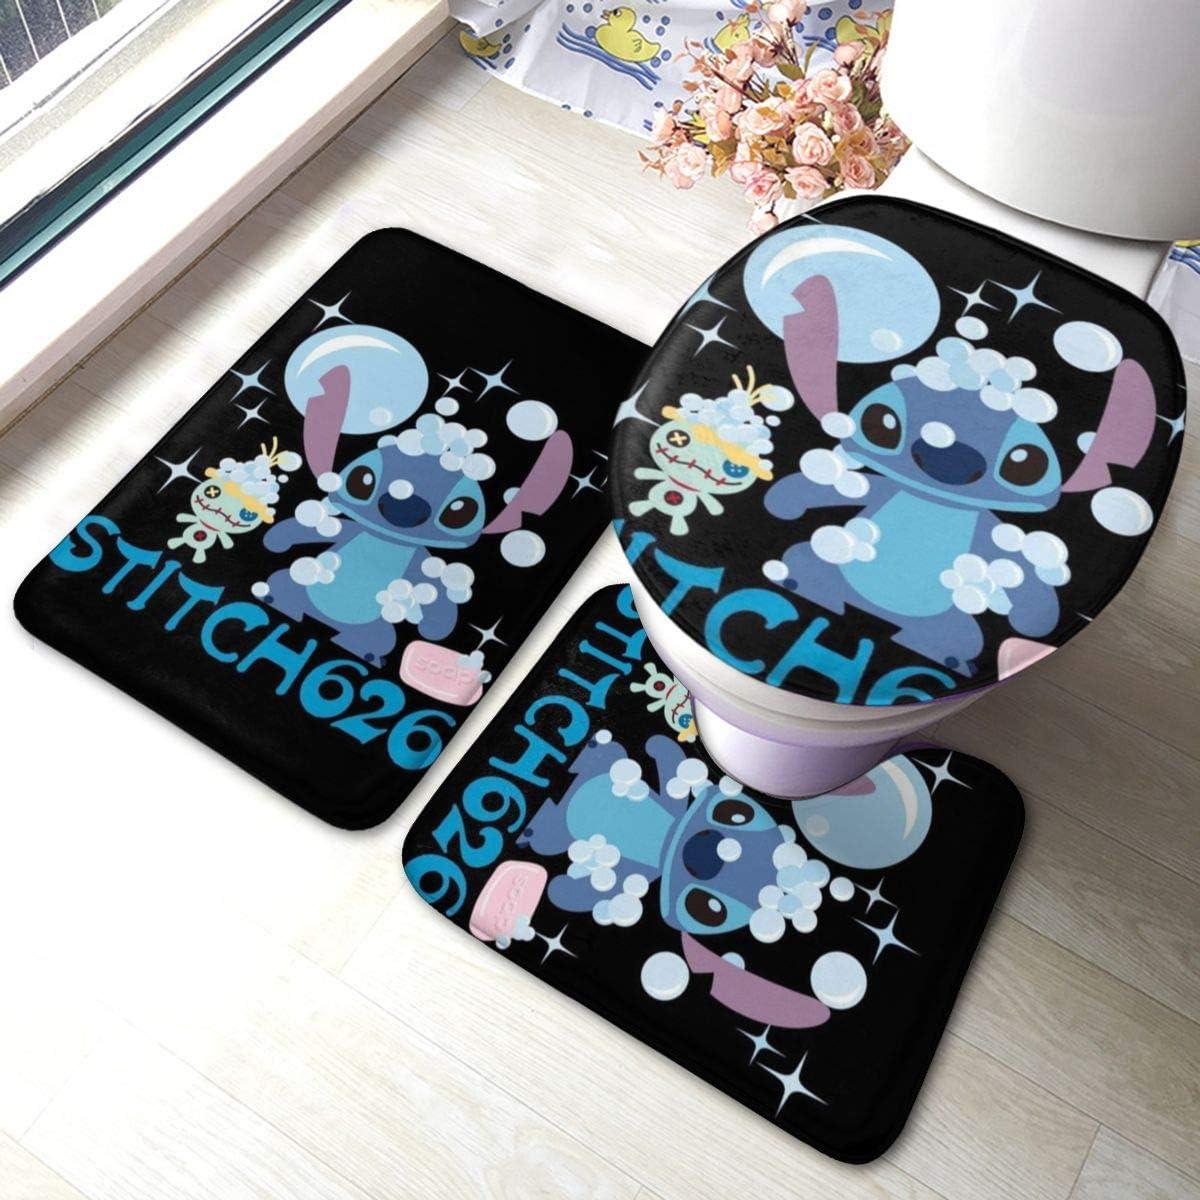 Lilo & Stitch Colorful Non Slip Bathroom Rug Set 3 Piece Anti-Skid Bath Mat 15.7 Inches X 23.6 Inches + Type U Contour Rug + Toilet Lid Cover Mat